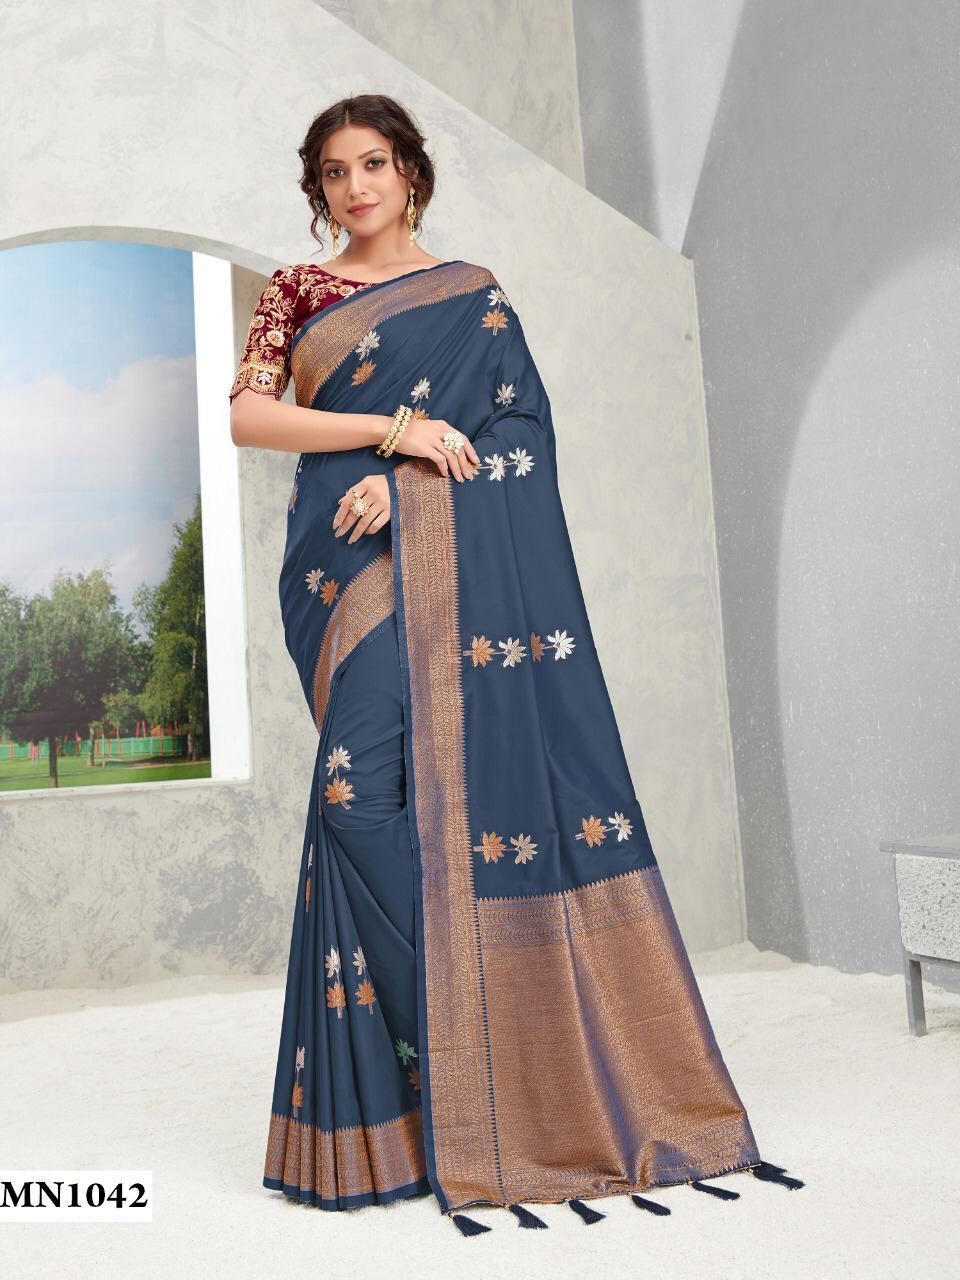 Thankar Roohi Vol 14 Designer Banarasi Pure Silk Wedding Wear Saree  Catalog at Wholesale rate